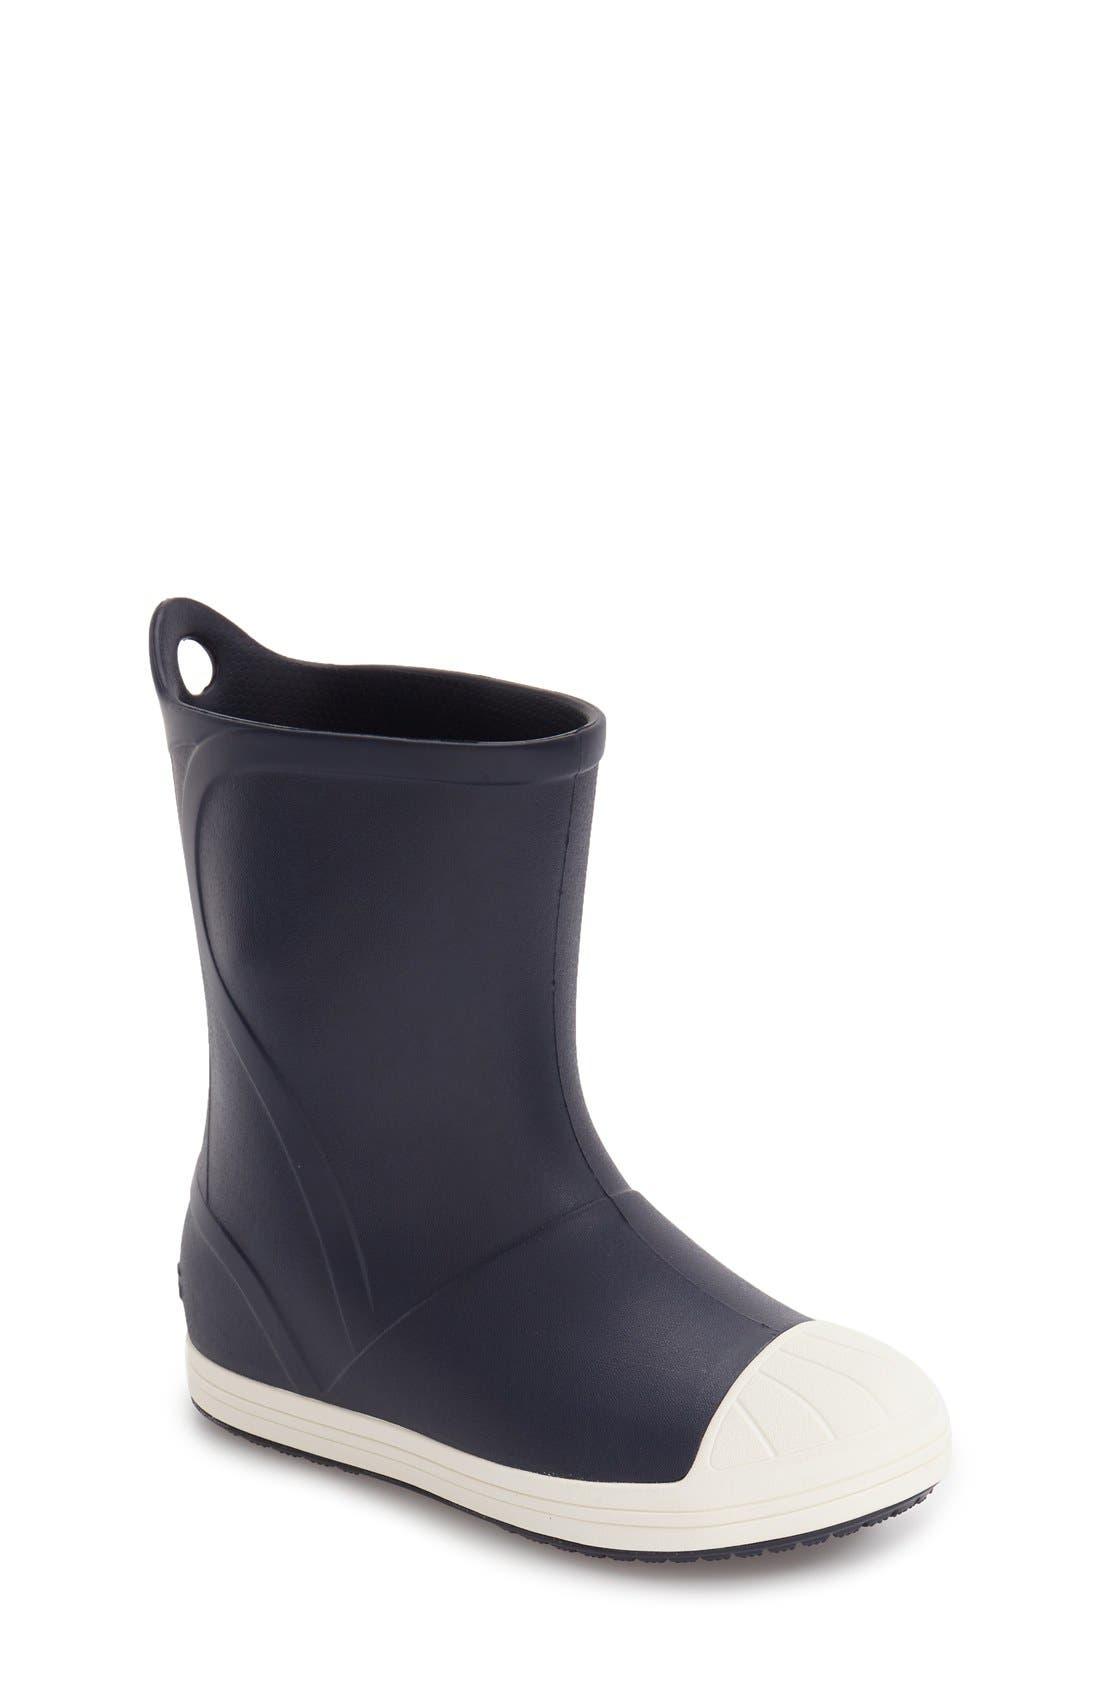 Main Image - CROCS™ Bump It Waterproof Rain Boot (Walker, Toddler & Little Kid)